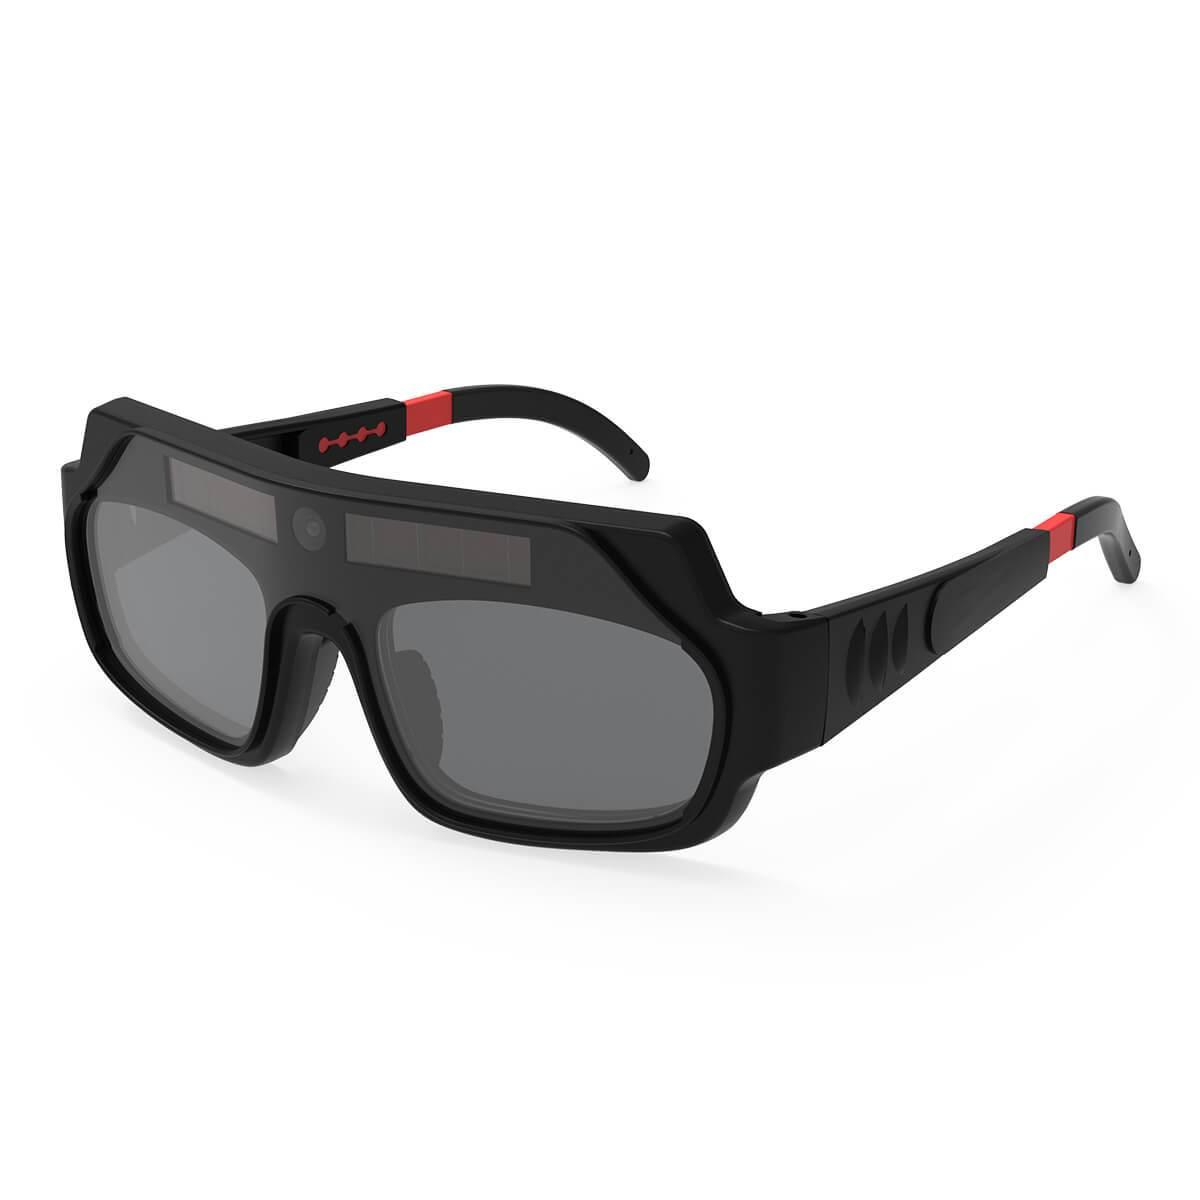 yeswelder Z200F Welding Goggles